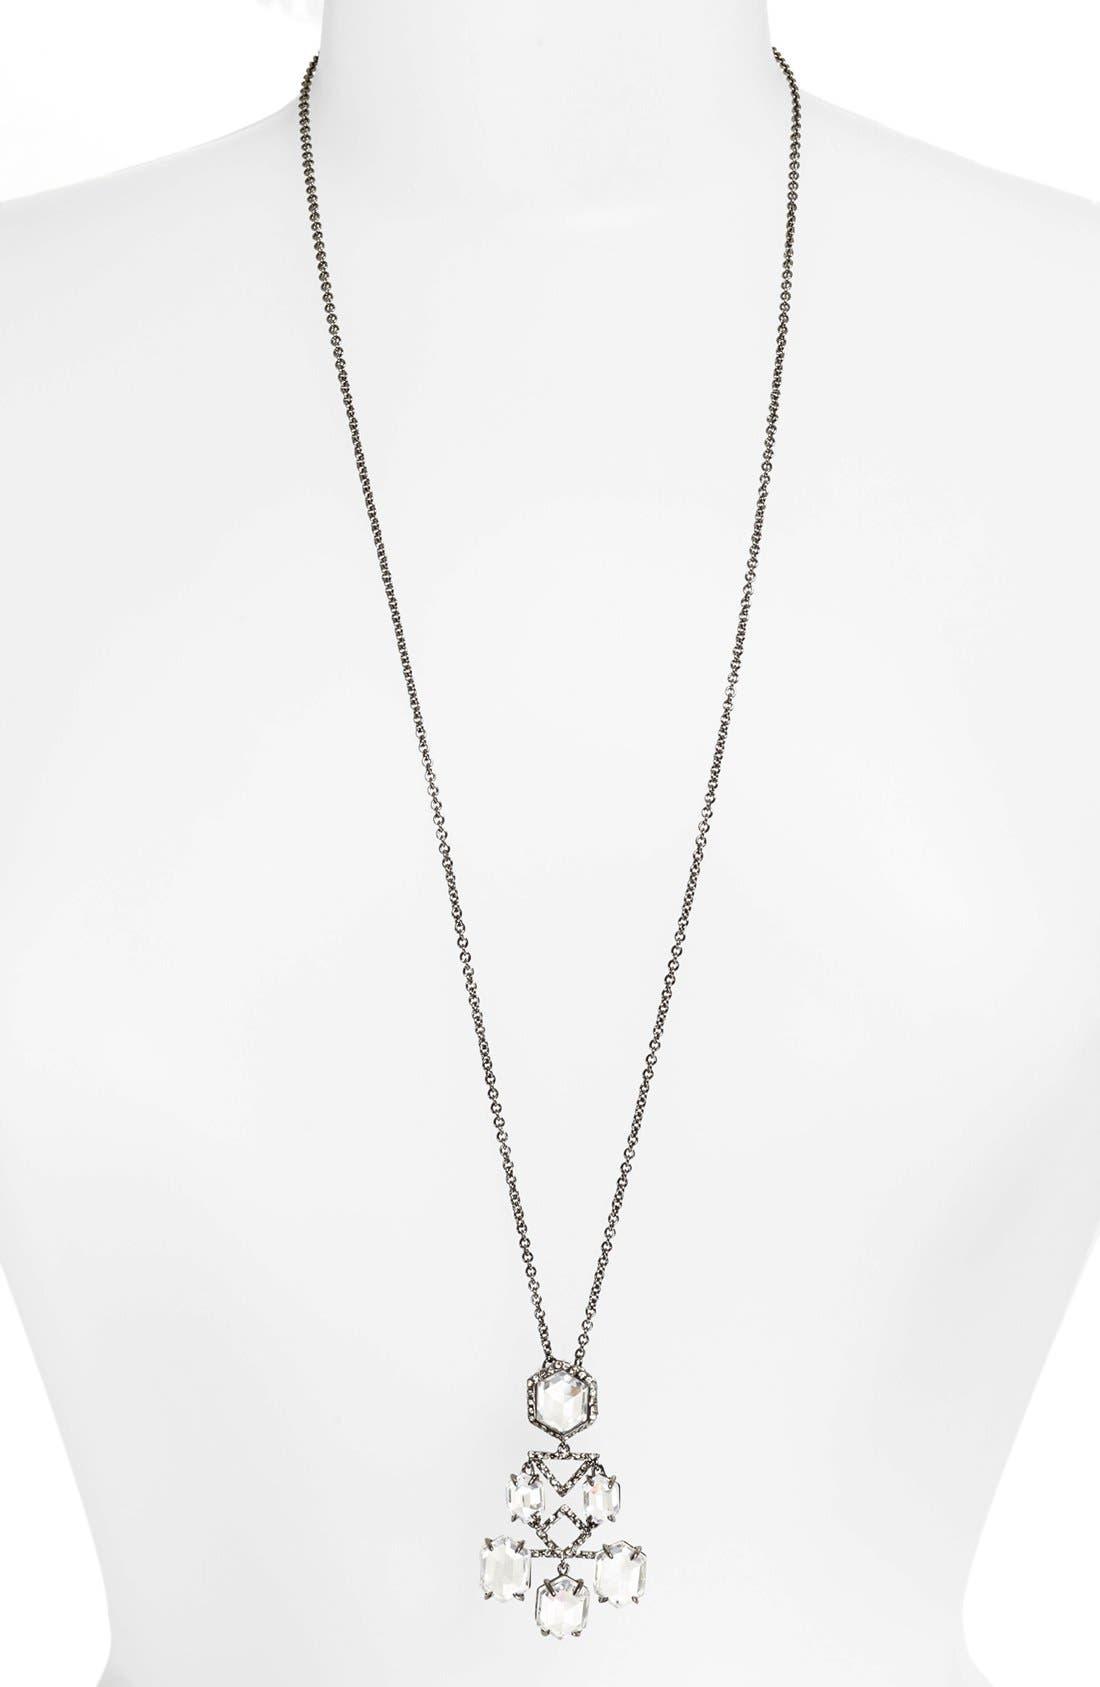 Alternate Image 1 Selected - Alexis Bittar 'Miss Havisham - Pavo' Long Pendant Necklace